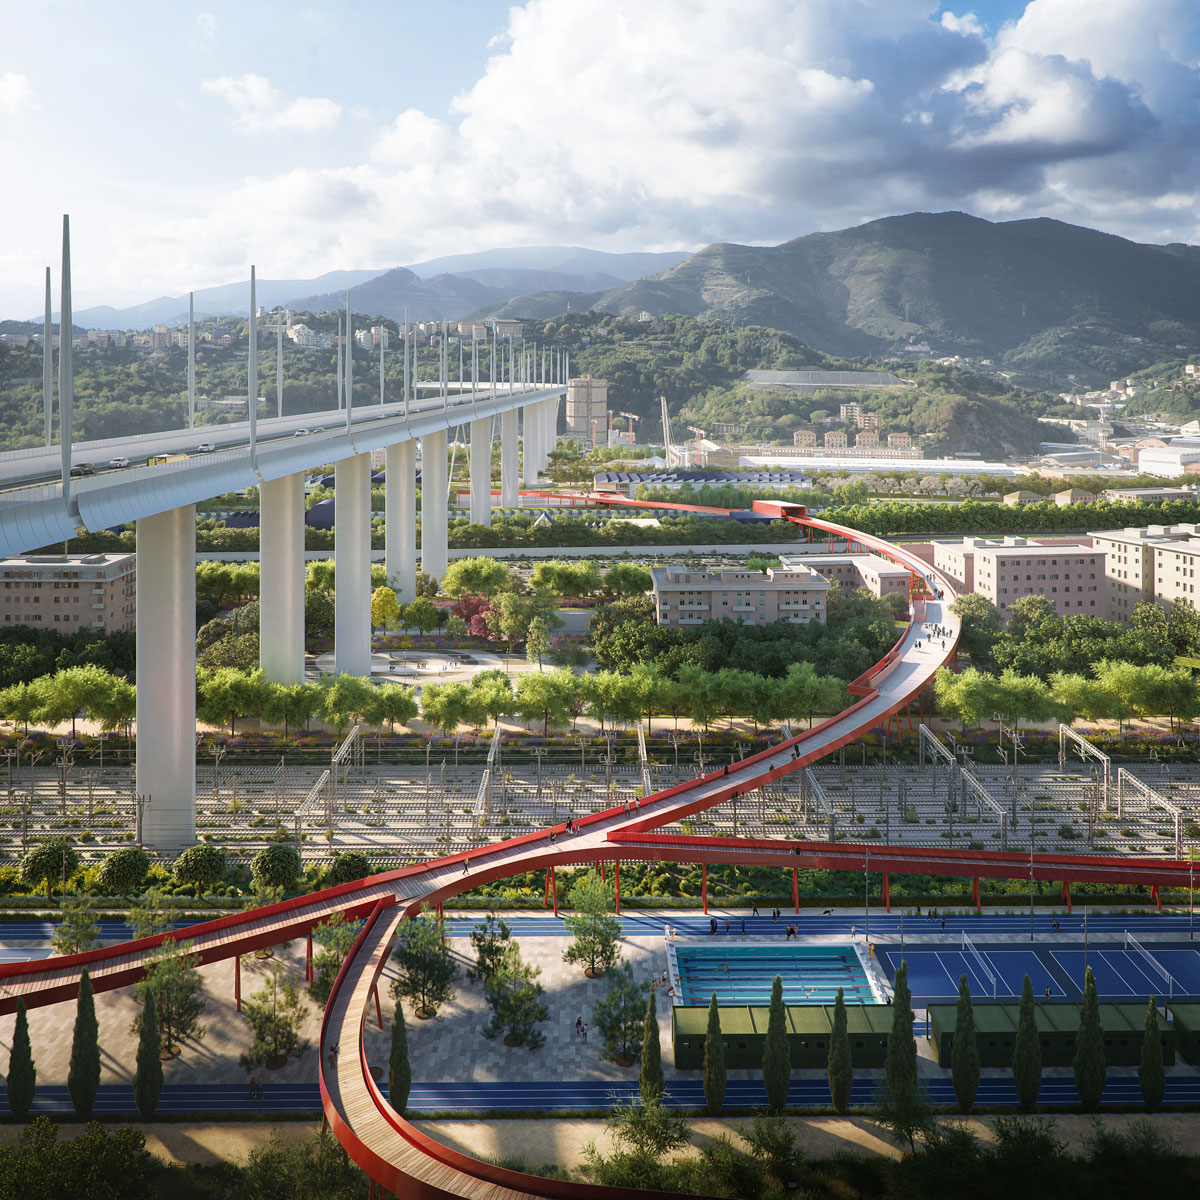 Morandi-Brücke in Genua Renzo Piano